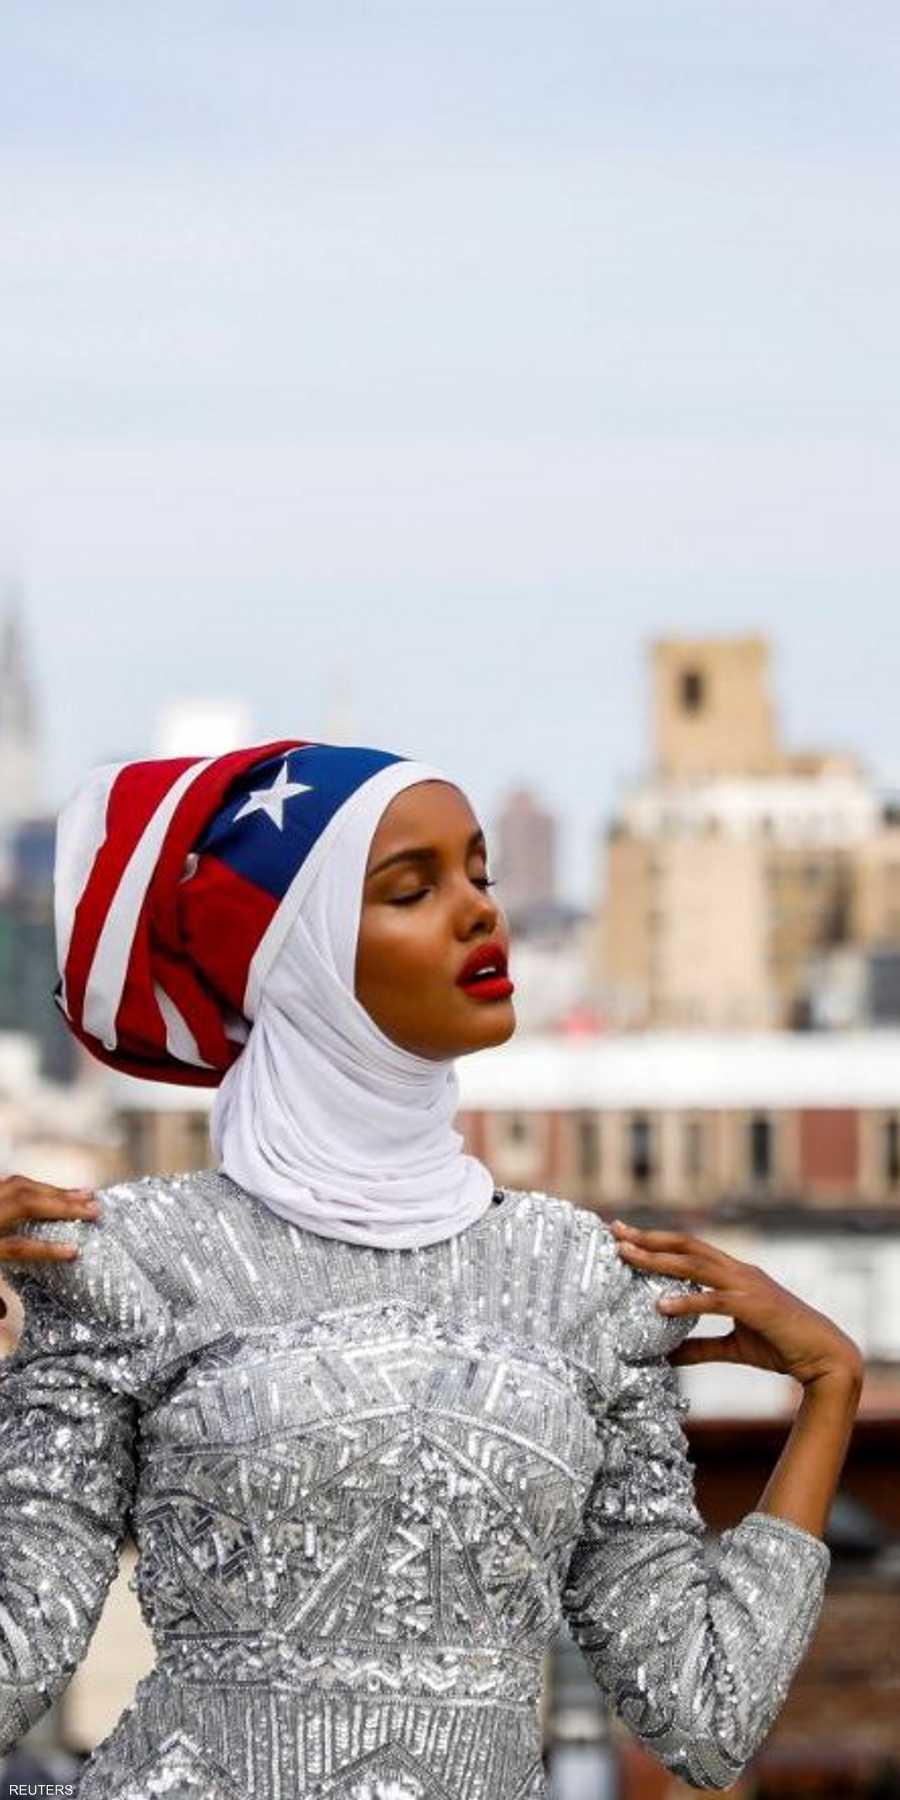 f6f718460 عارضة أزياء محجبة تحطم الحواجز في عالم الموضة | أخبار سكاي نيوز عربية